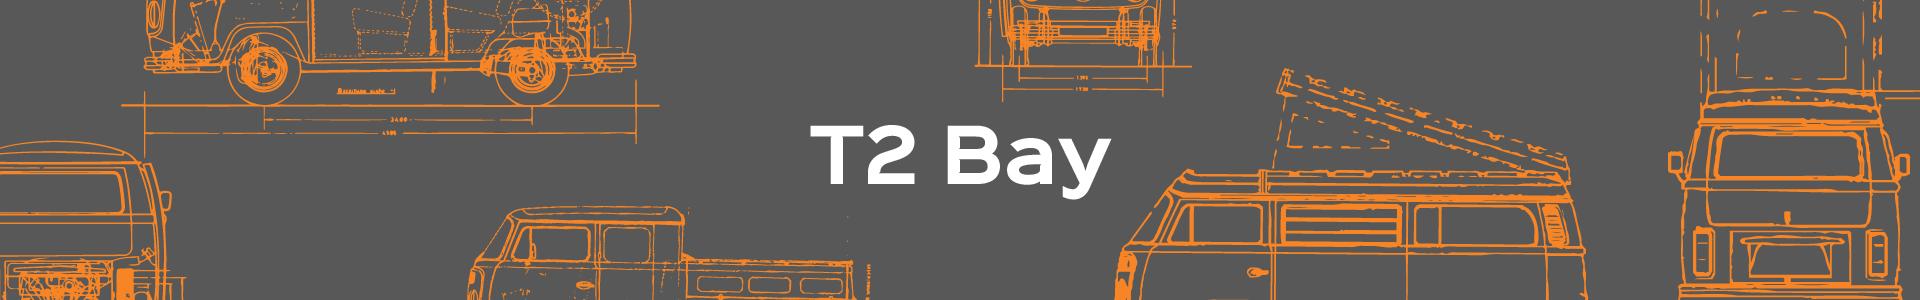 T2 Bay